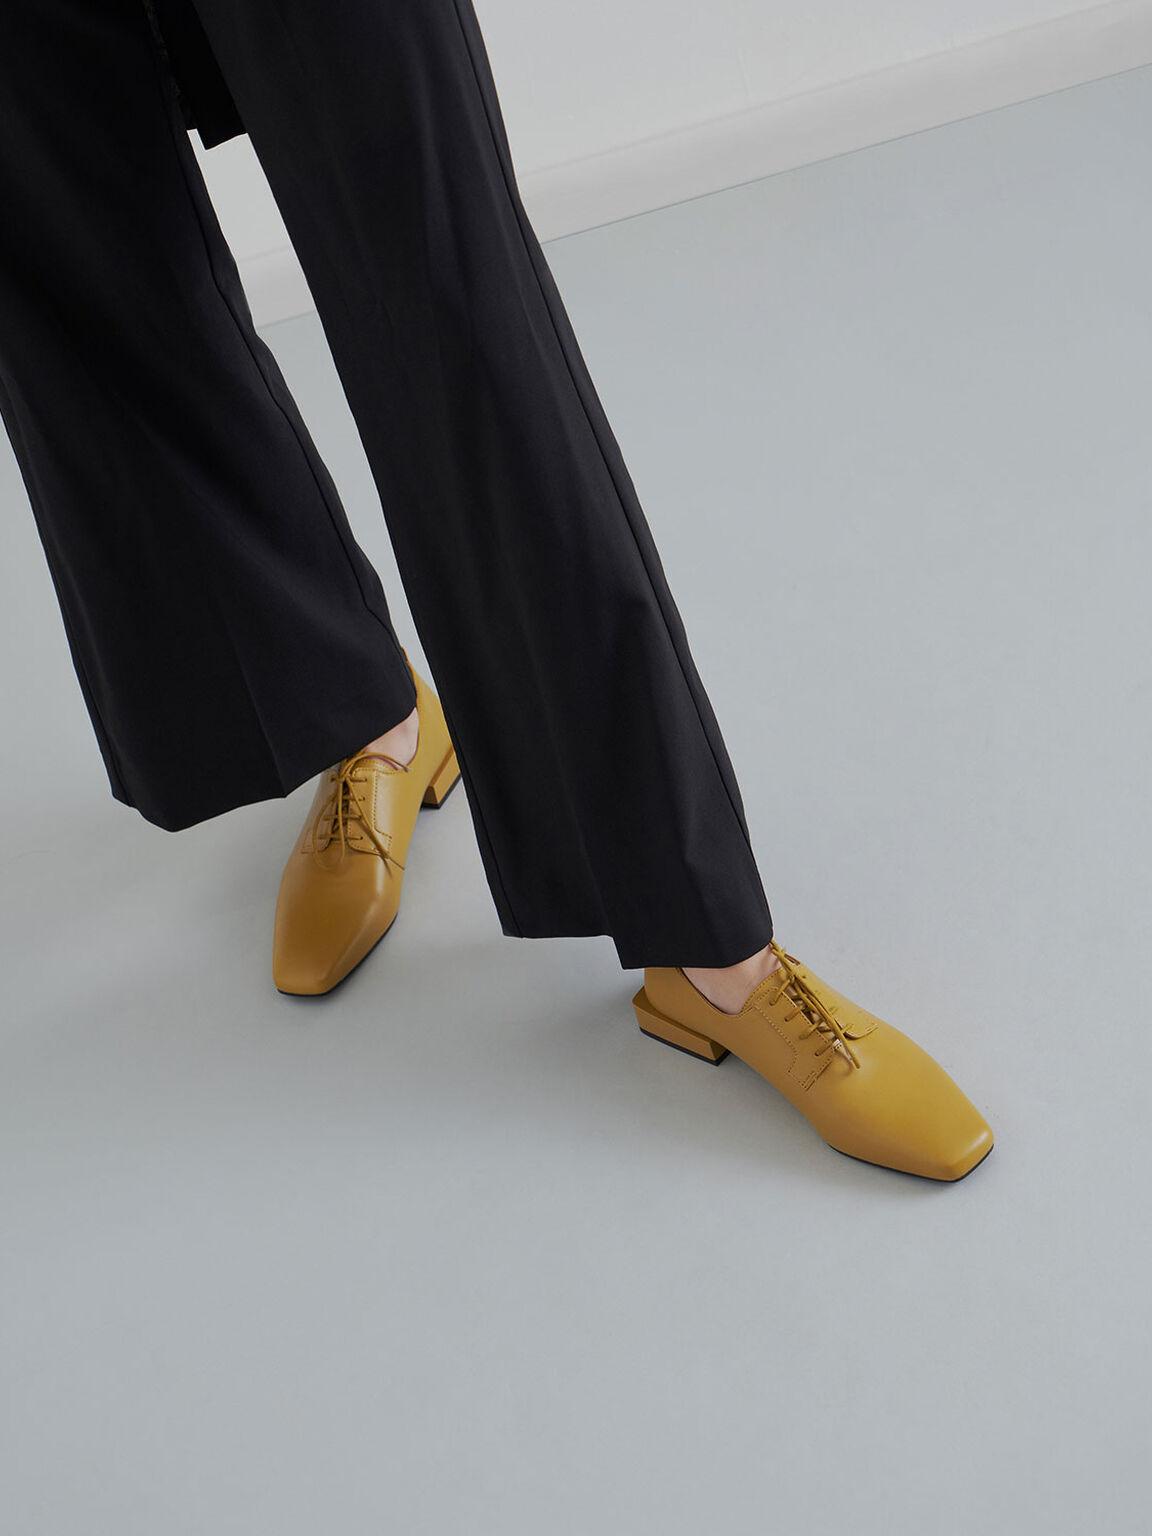 Square Toe Oxford Shoes, Mustard, hi-res